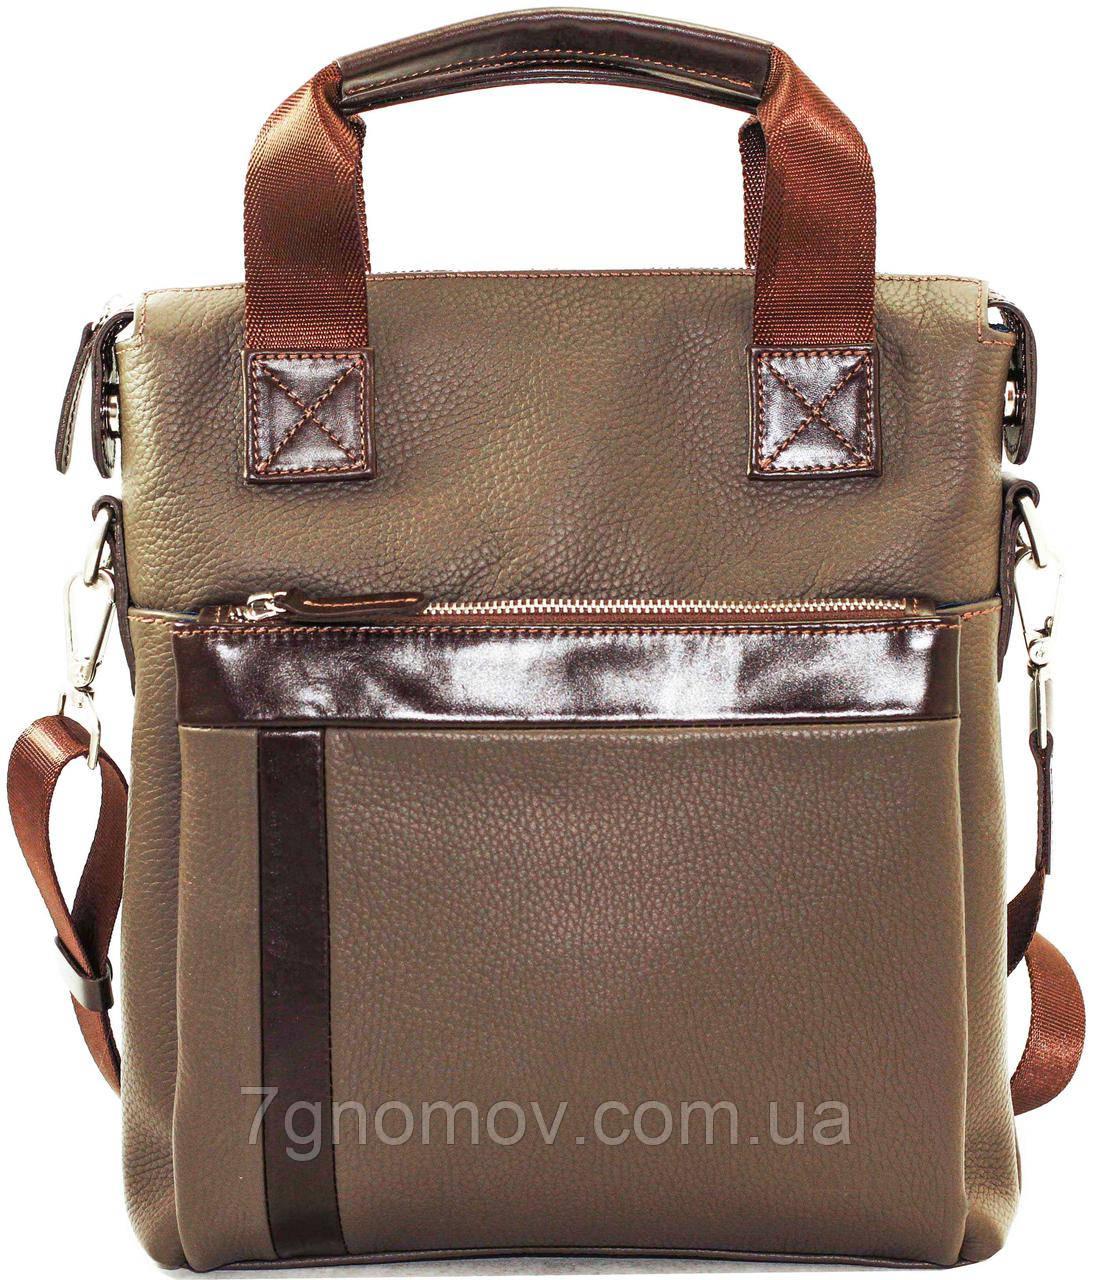 Мужская сумка VATTO Mk41.2 F13Kаz400